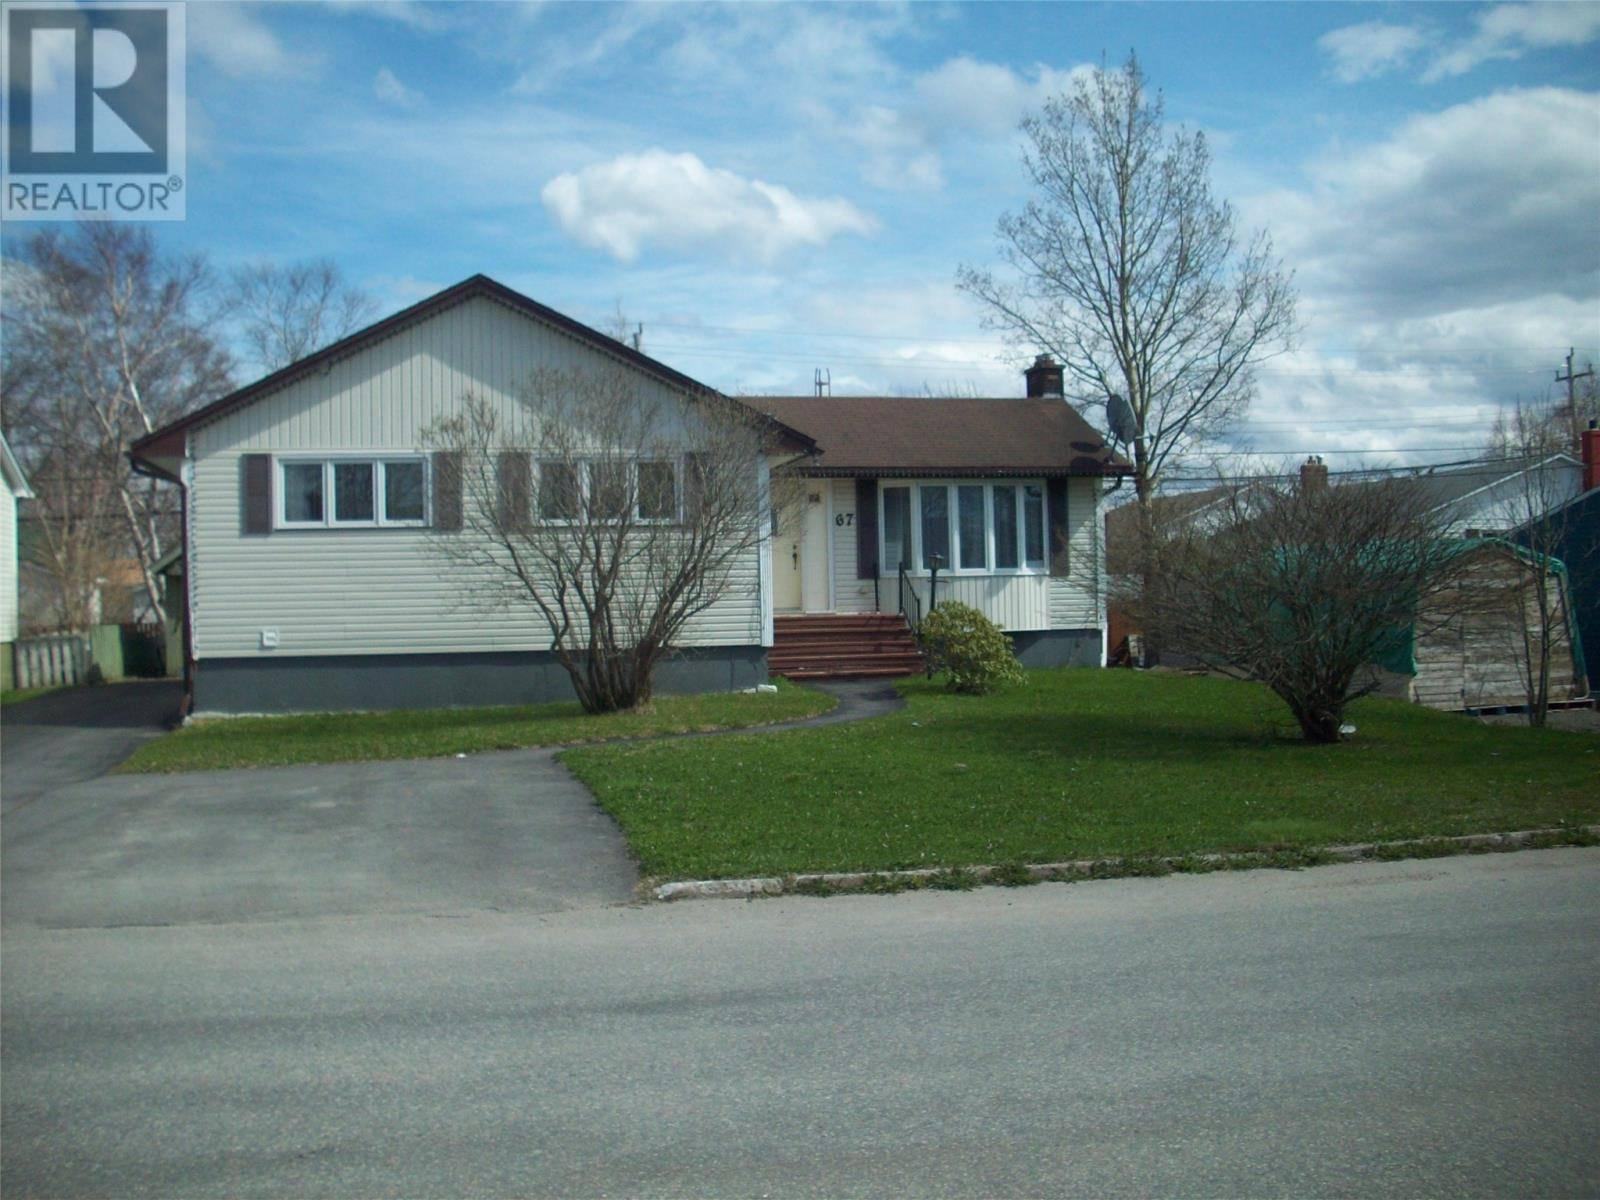 House for sale at 67 Hawker Cres Gander Newfoundland - MLS: 1196974